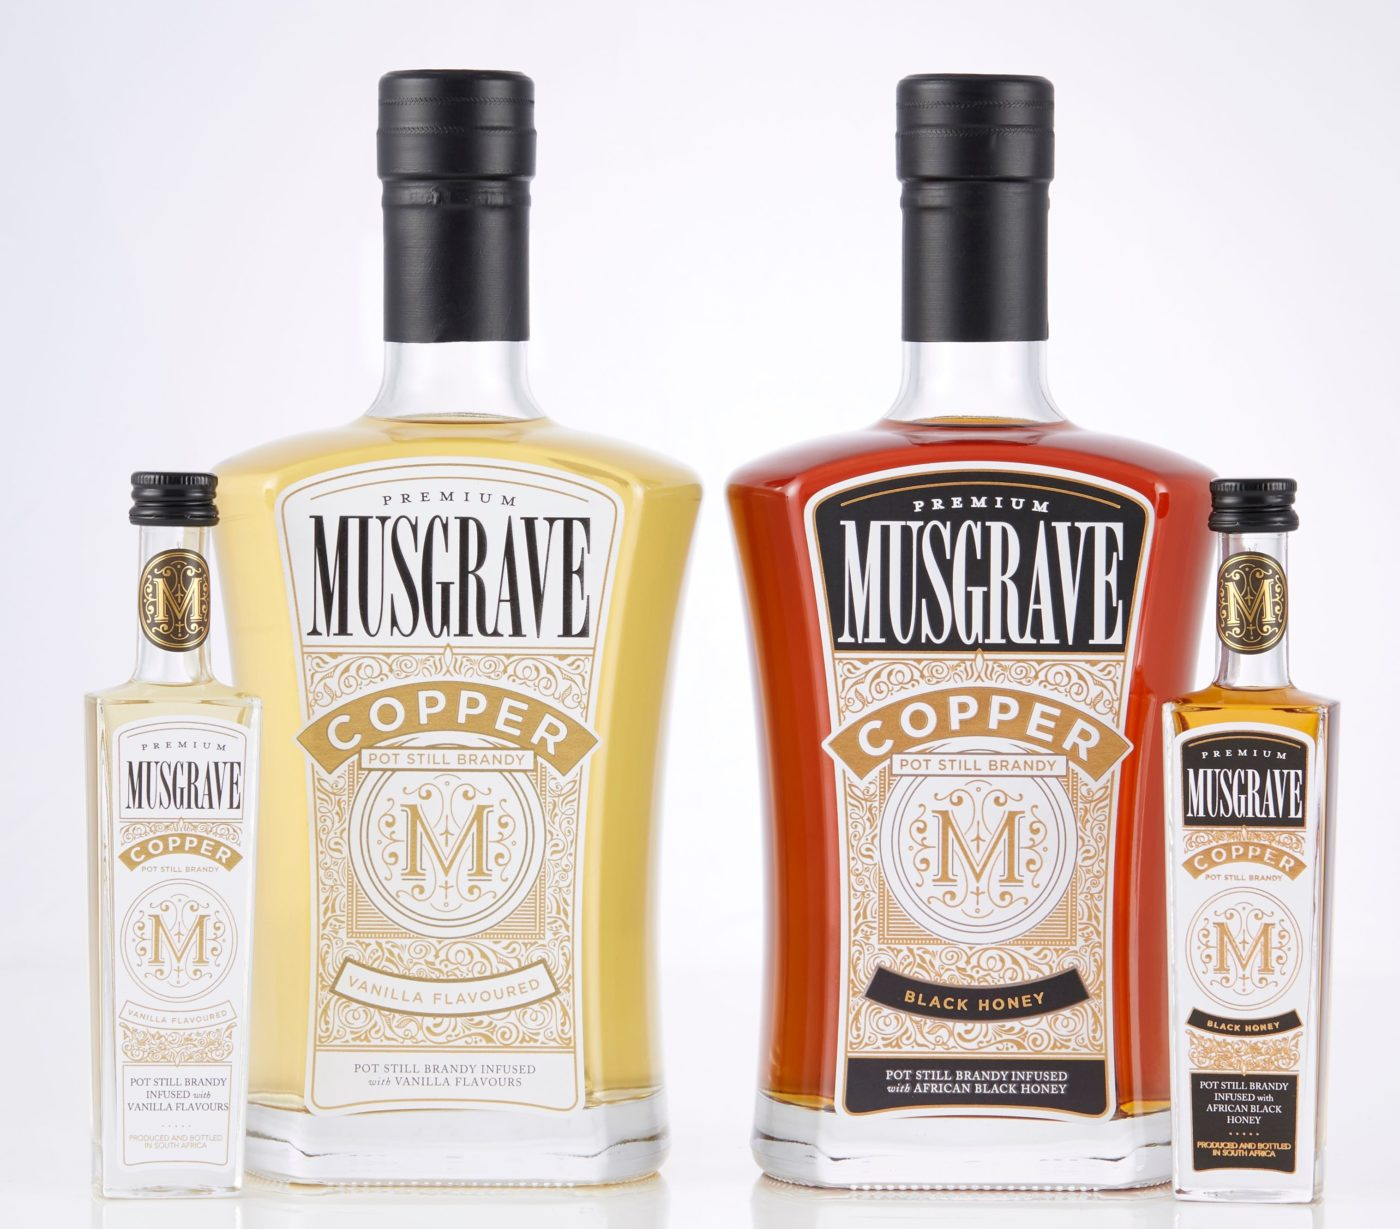 Musgrave Copper Brandy photo